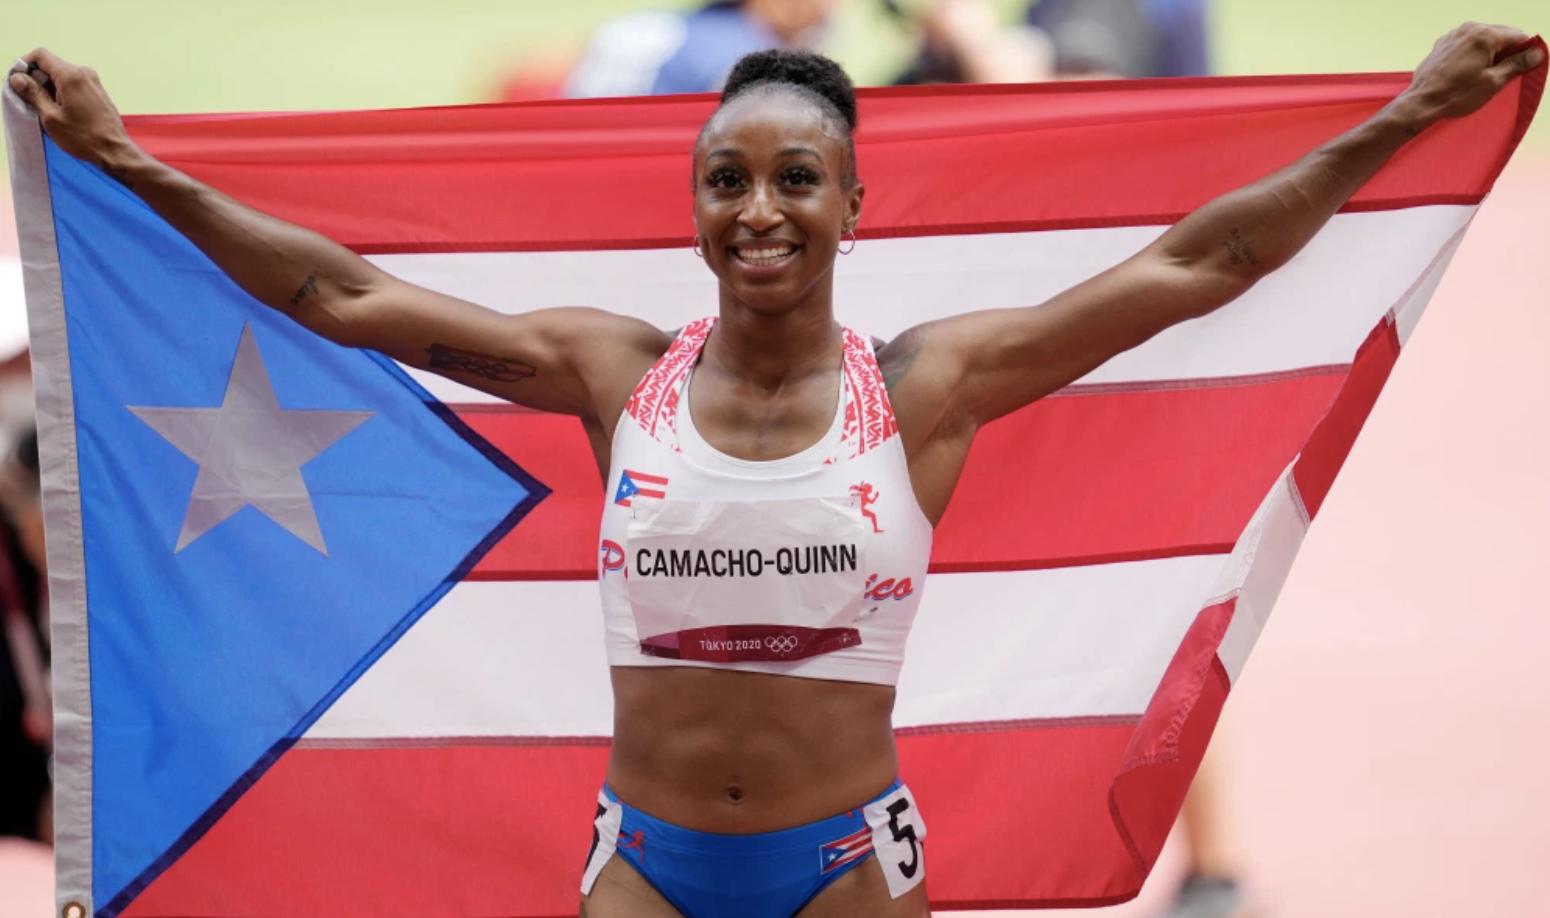 Puerto Rican Jasmine Camacho-Quinn Wins Gold!